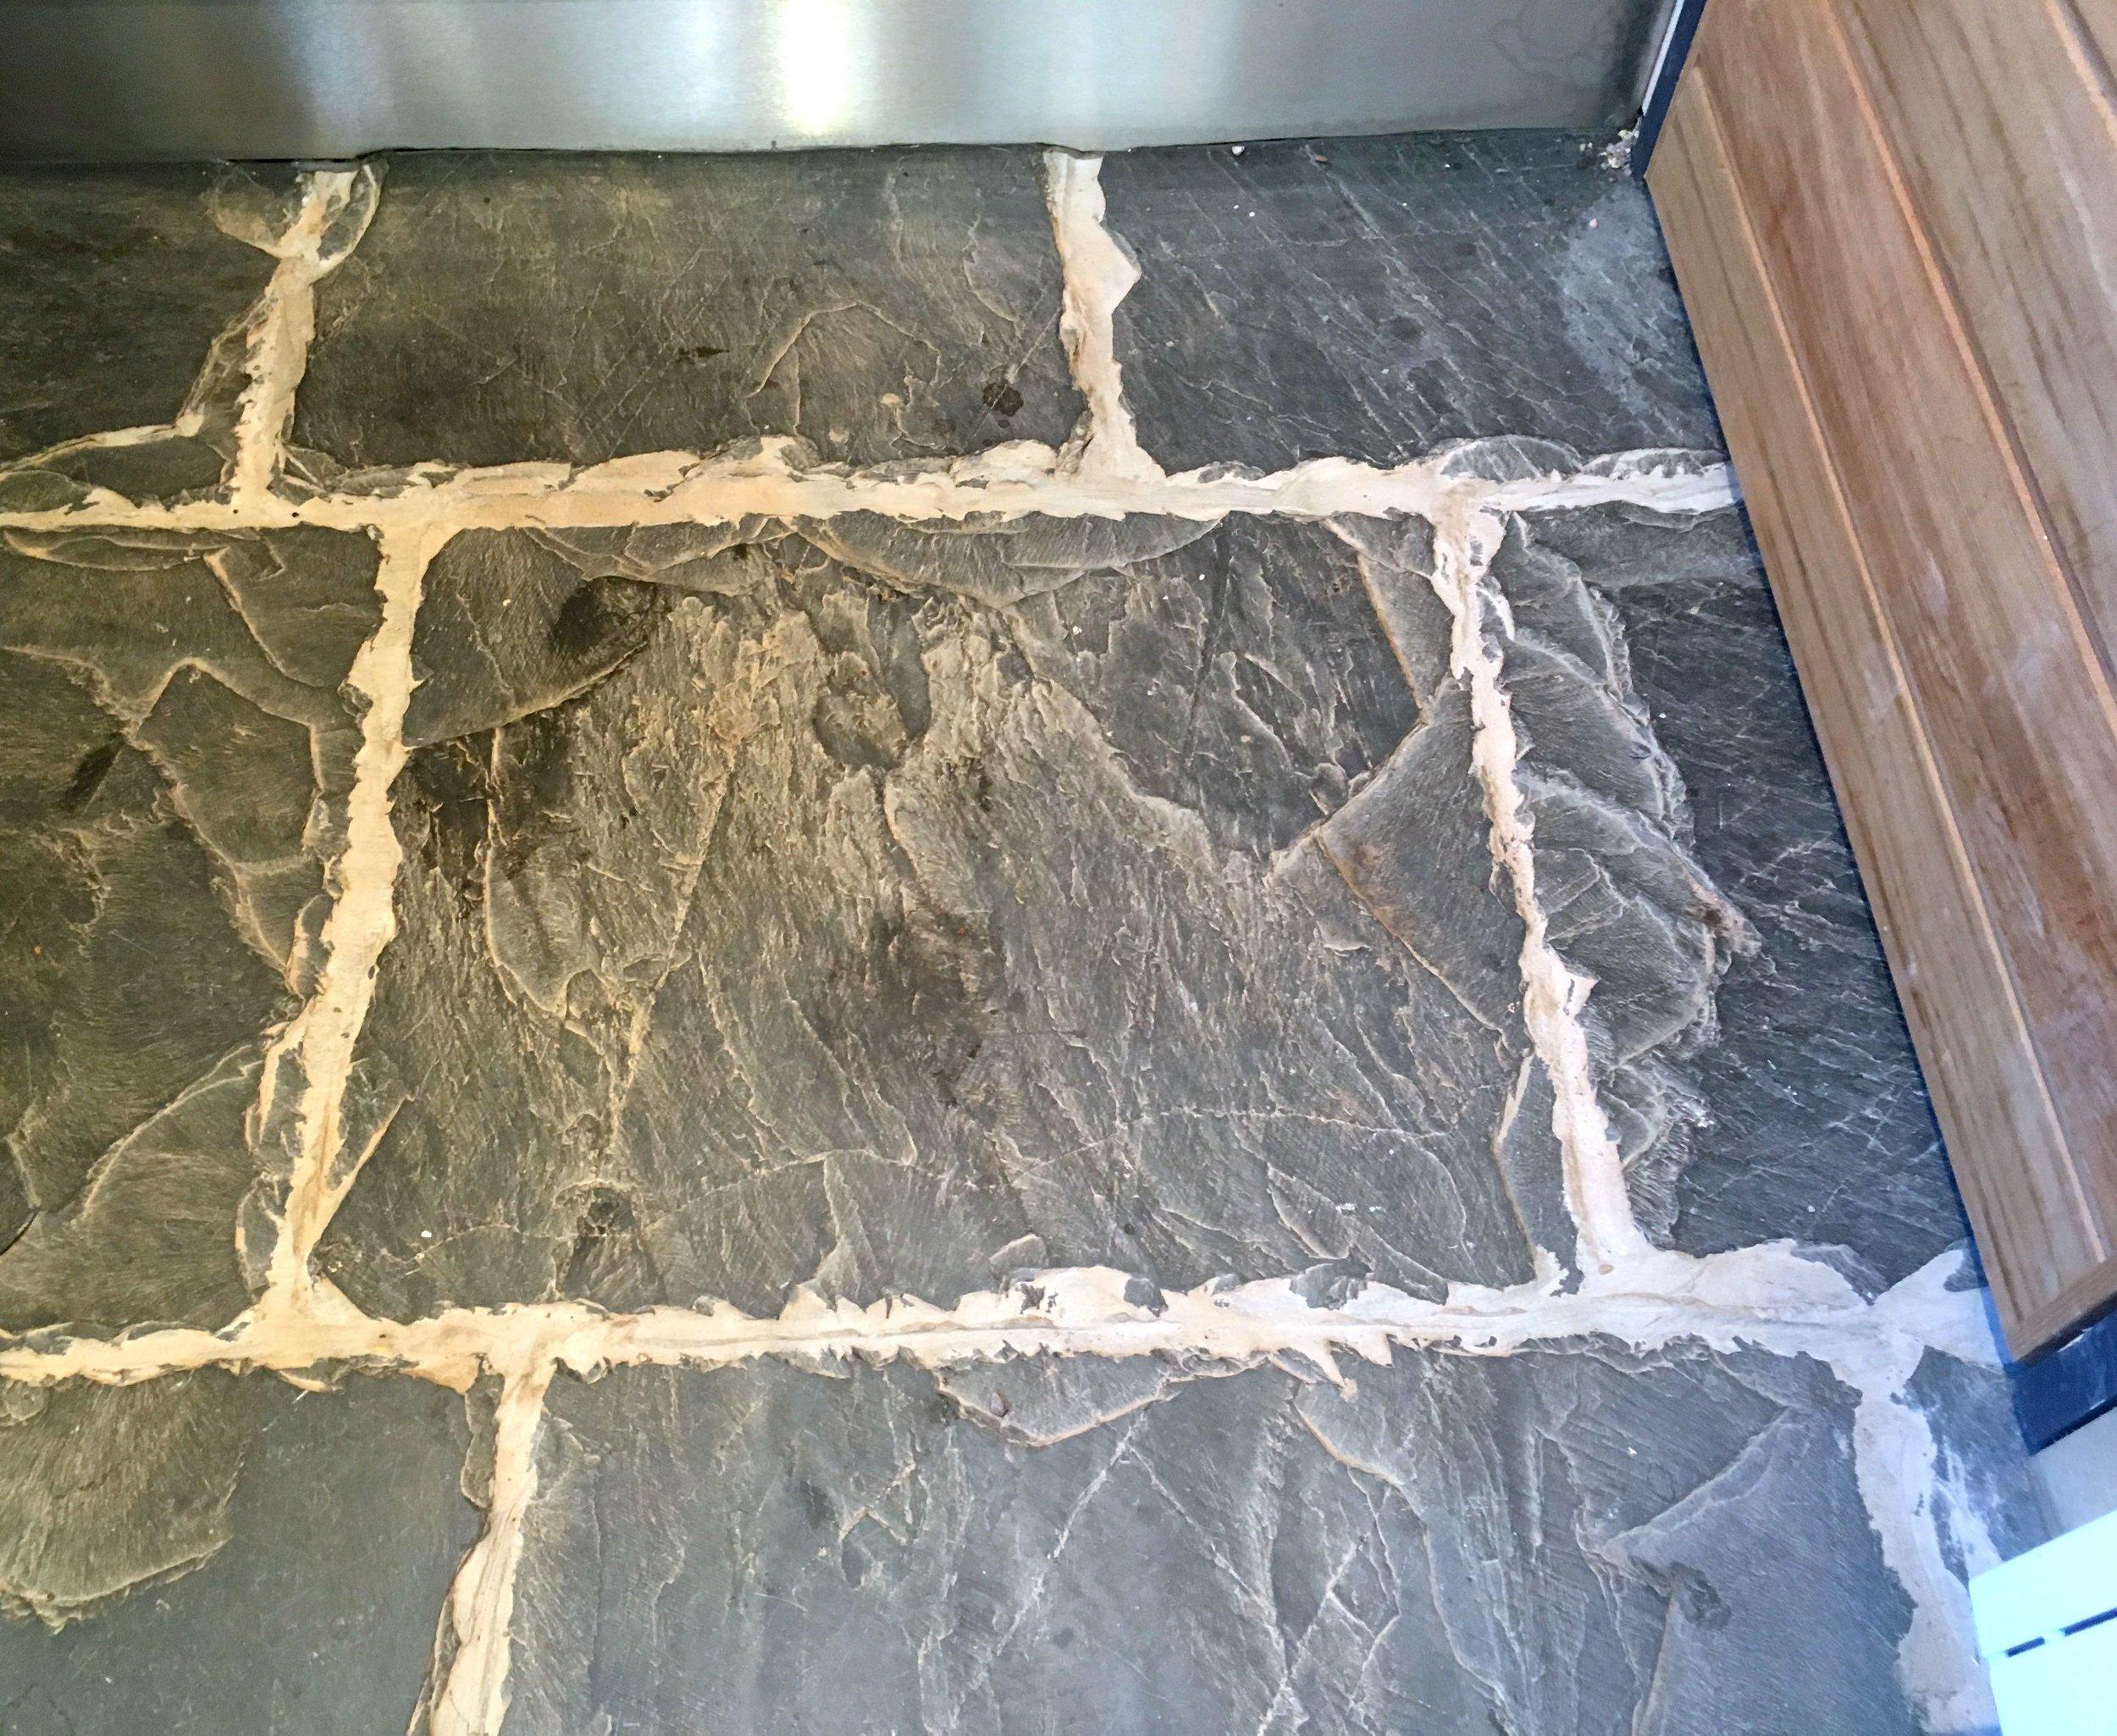 rustic tiled floor at NT Killerton garden loos